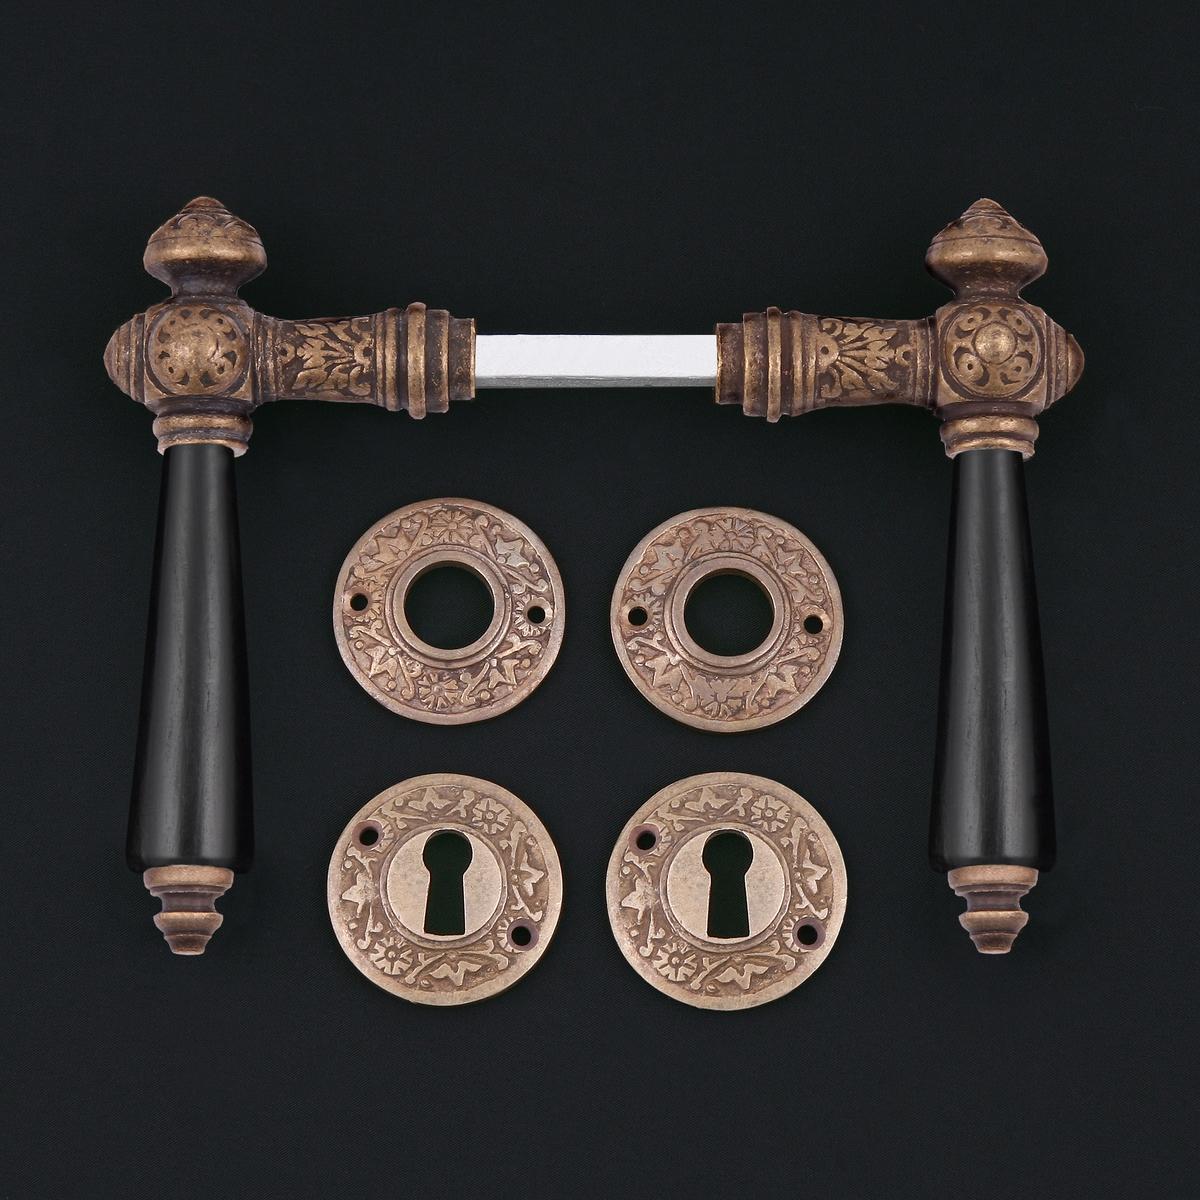 Zimmertür Rosettengarnitur - antike Türdrücker, Türklinken, Türbeschläge